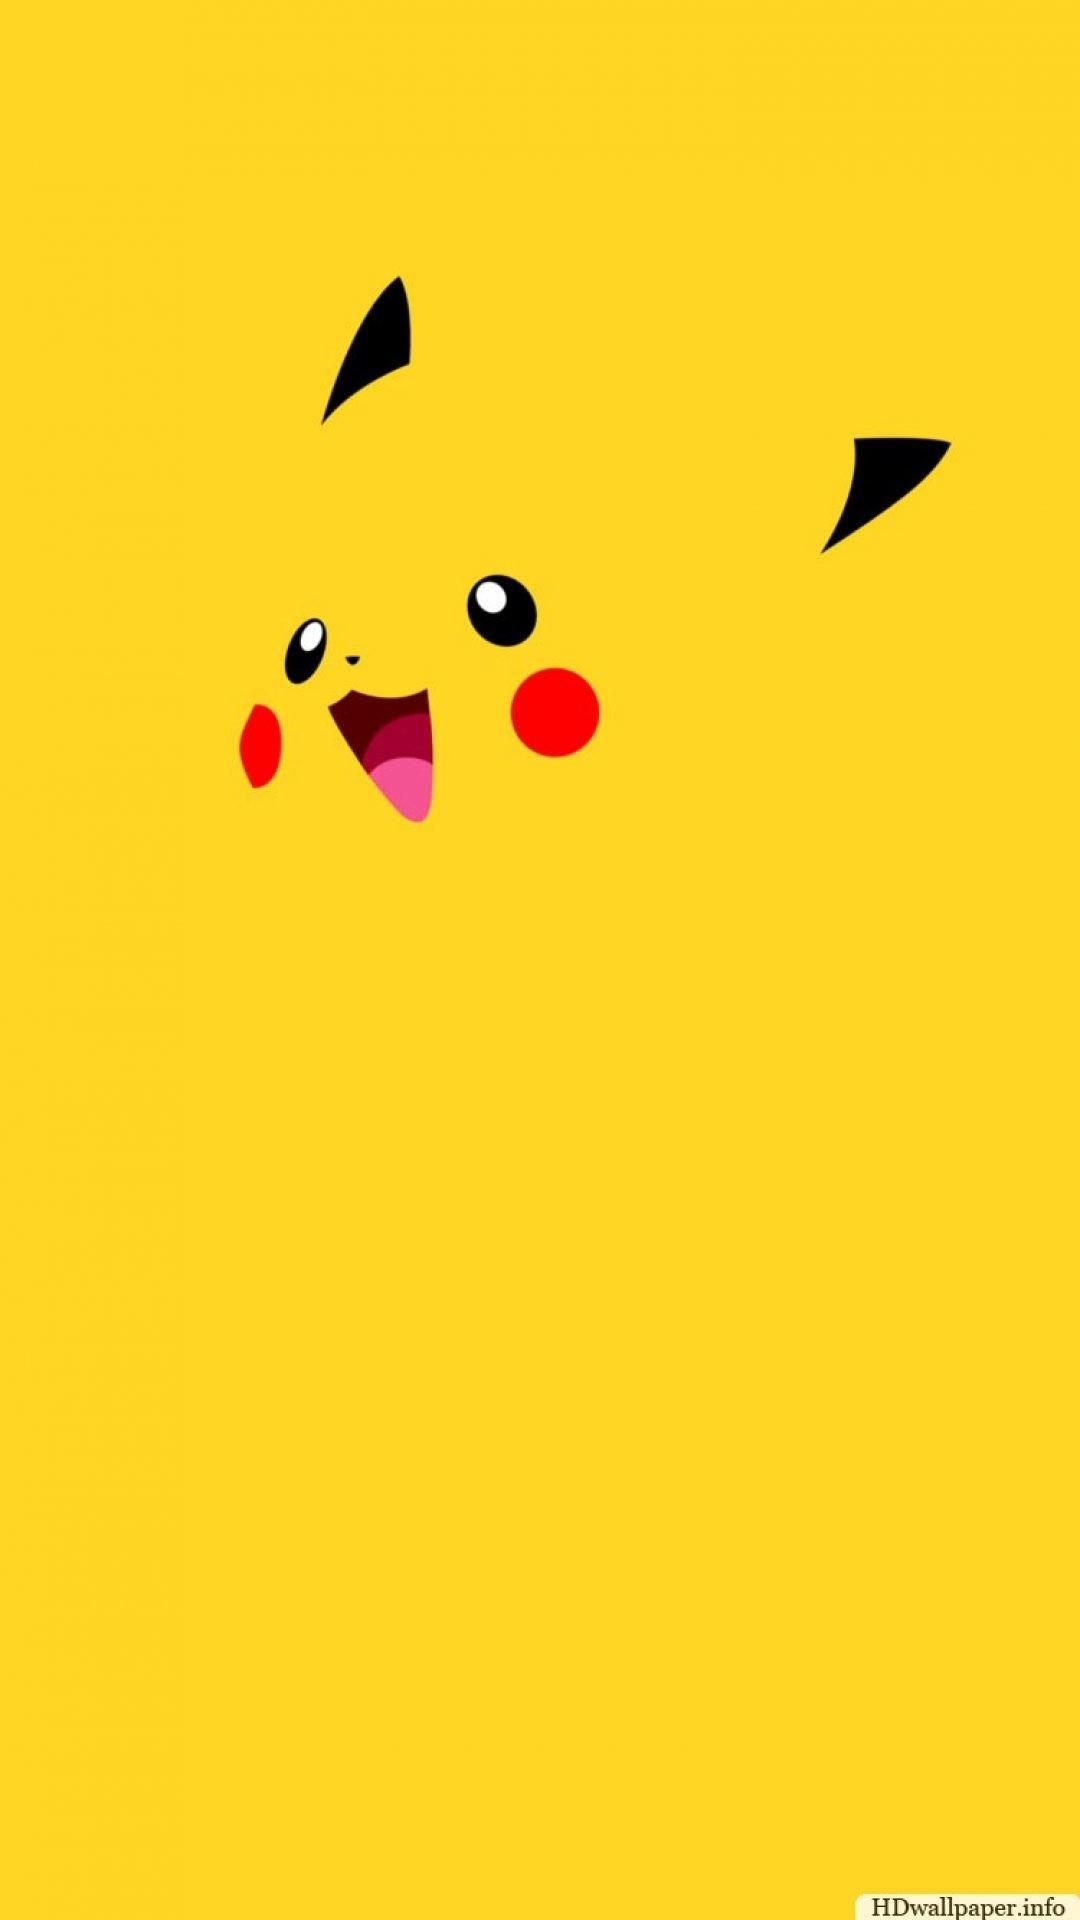 pikachu wallpaper iphone 6